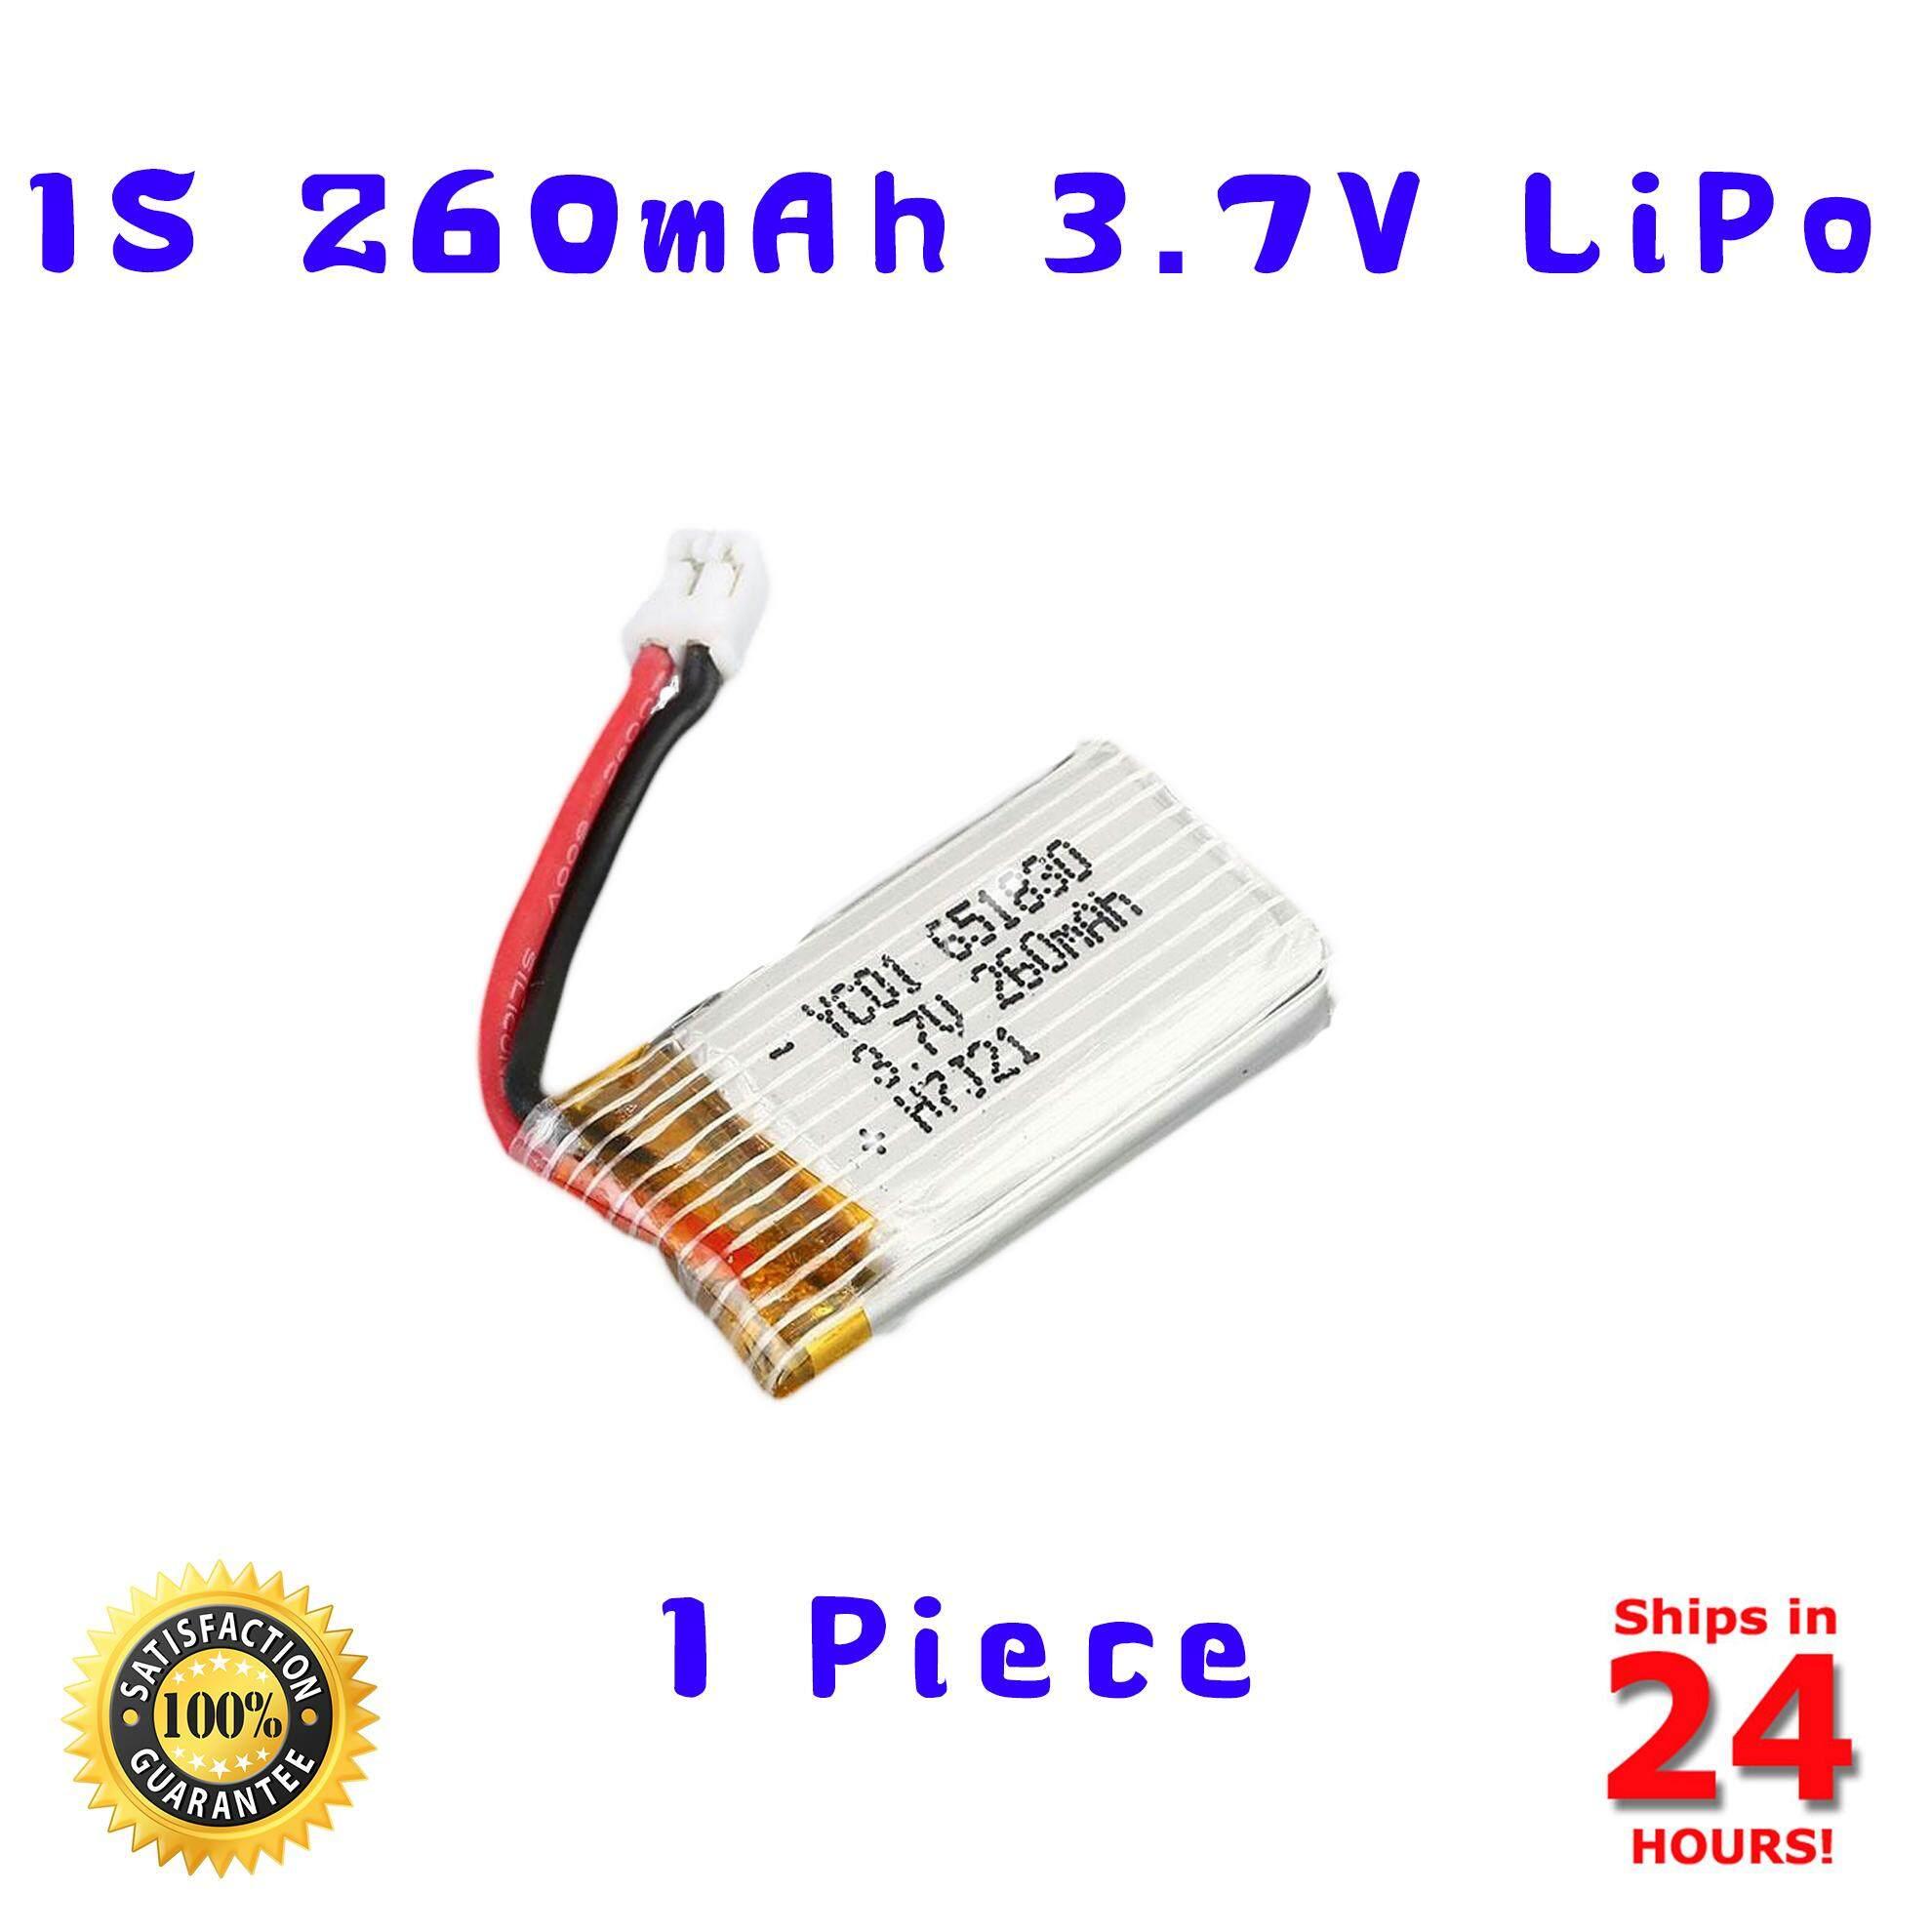 1s 3.7v 260mah Lipo Battery, High Performance, Lightweight, Secure Connector, Silicone Heat Resistant Wires - 1s 3.7v 260mah Lipo Battery, มีประสิทธิภาพสูง, มีน้ำหนักเบา, ตัวเชื่อมต่อที่ปลอดภัย, สายทนความร้อนด้วยซิลิโคน.